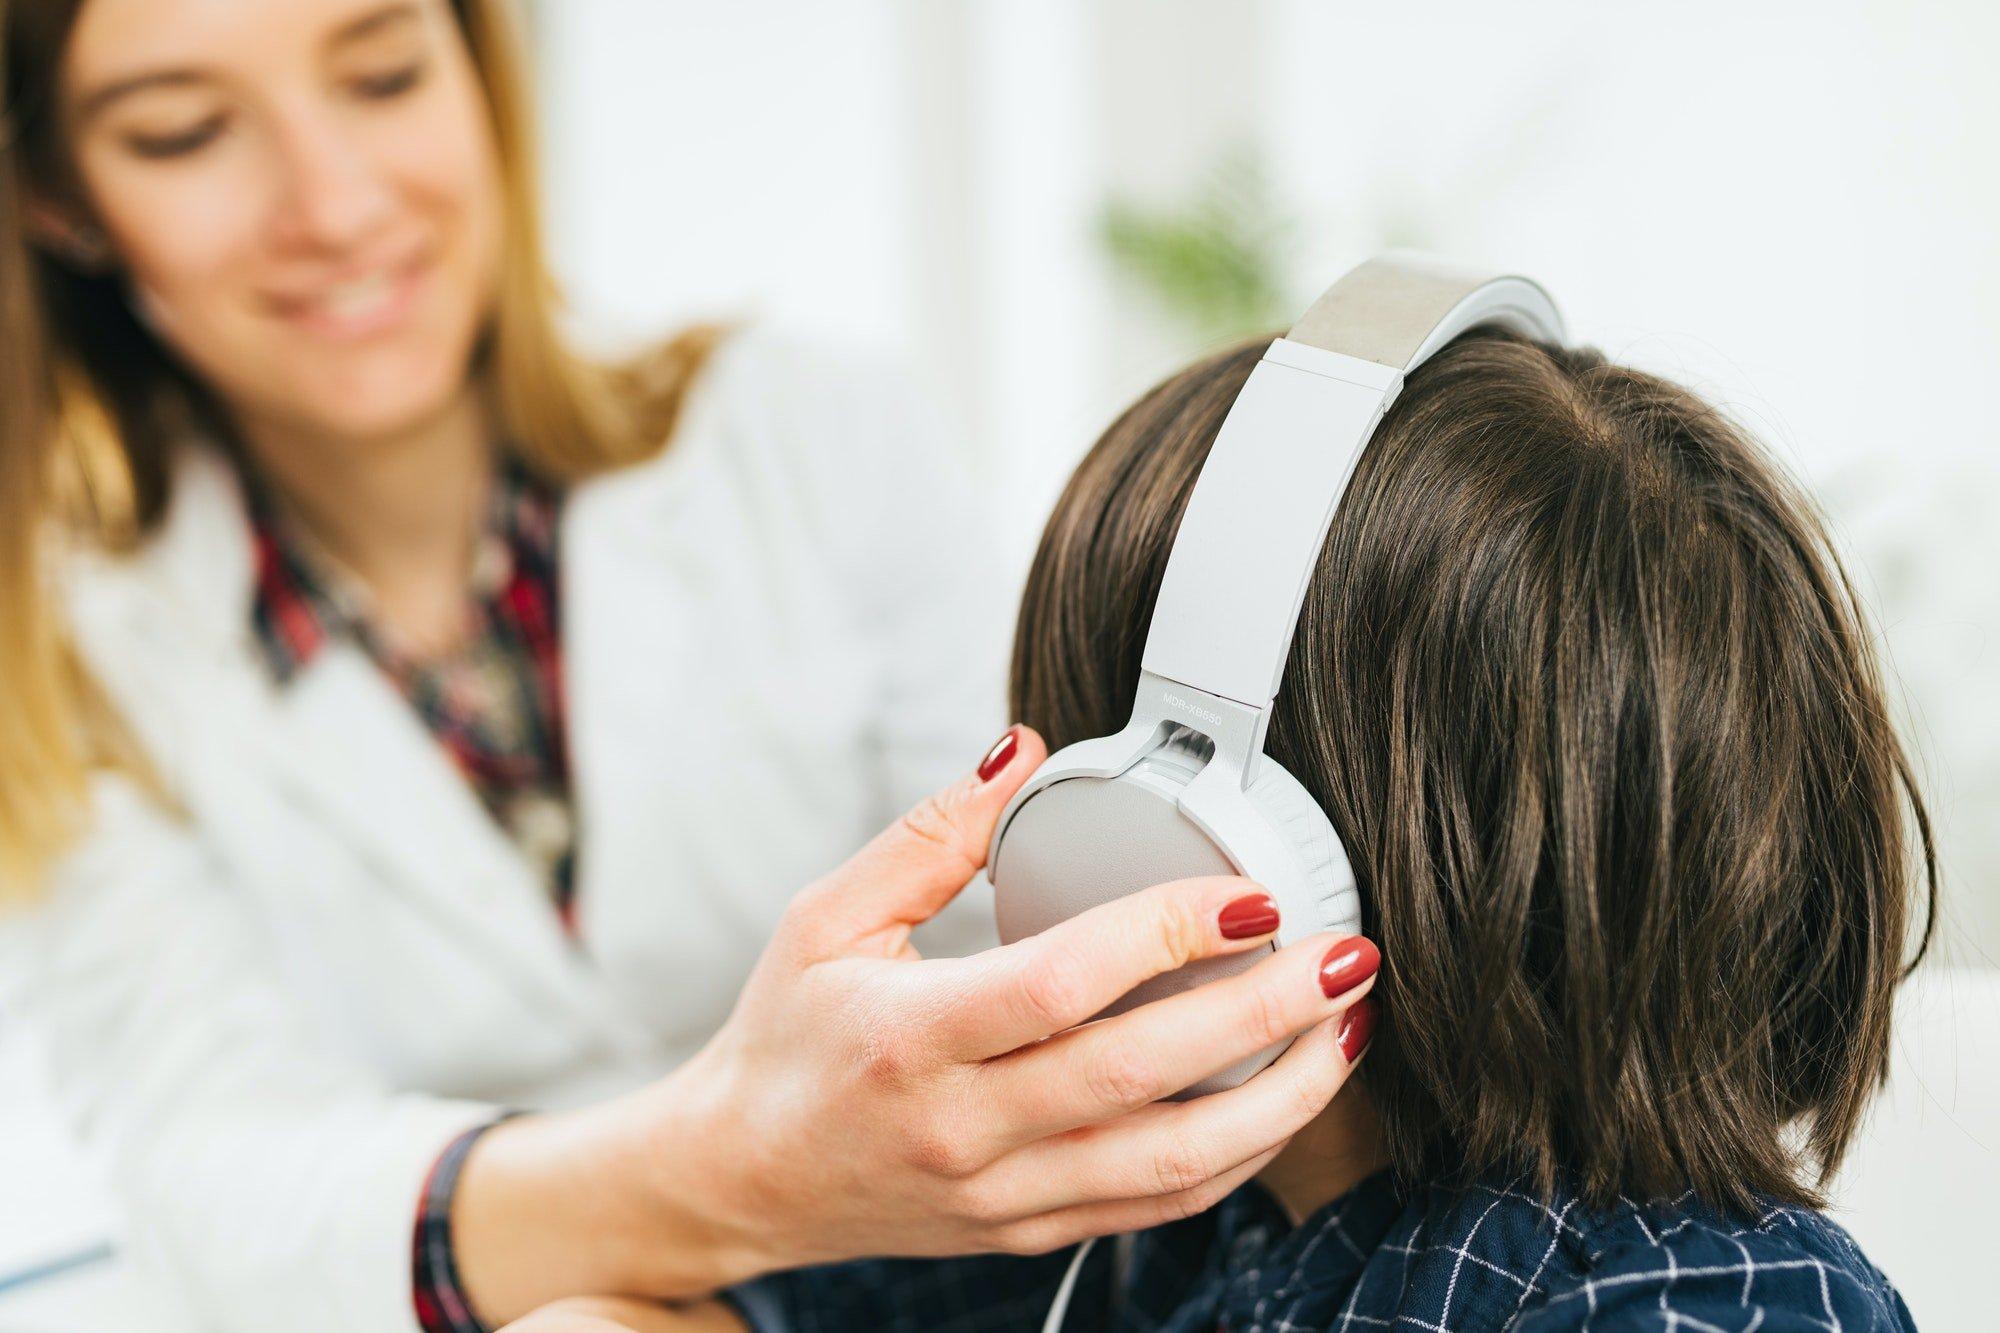 Otorinolaringoiatra durante un esame audiometrico